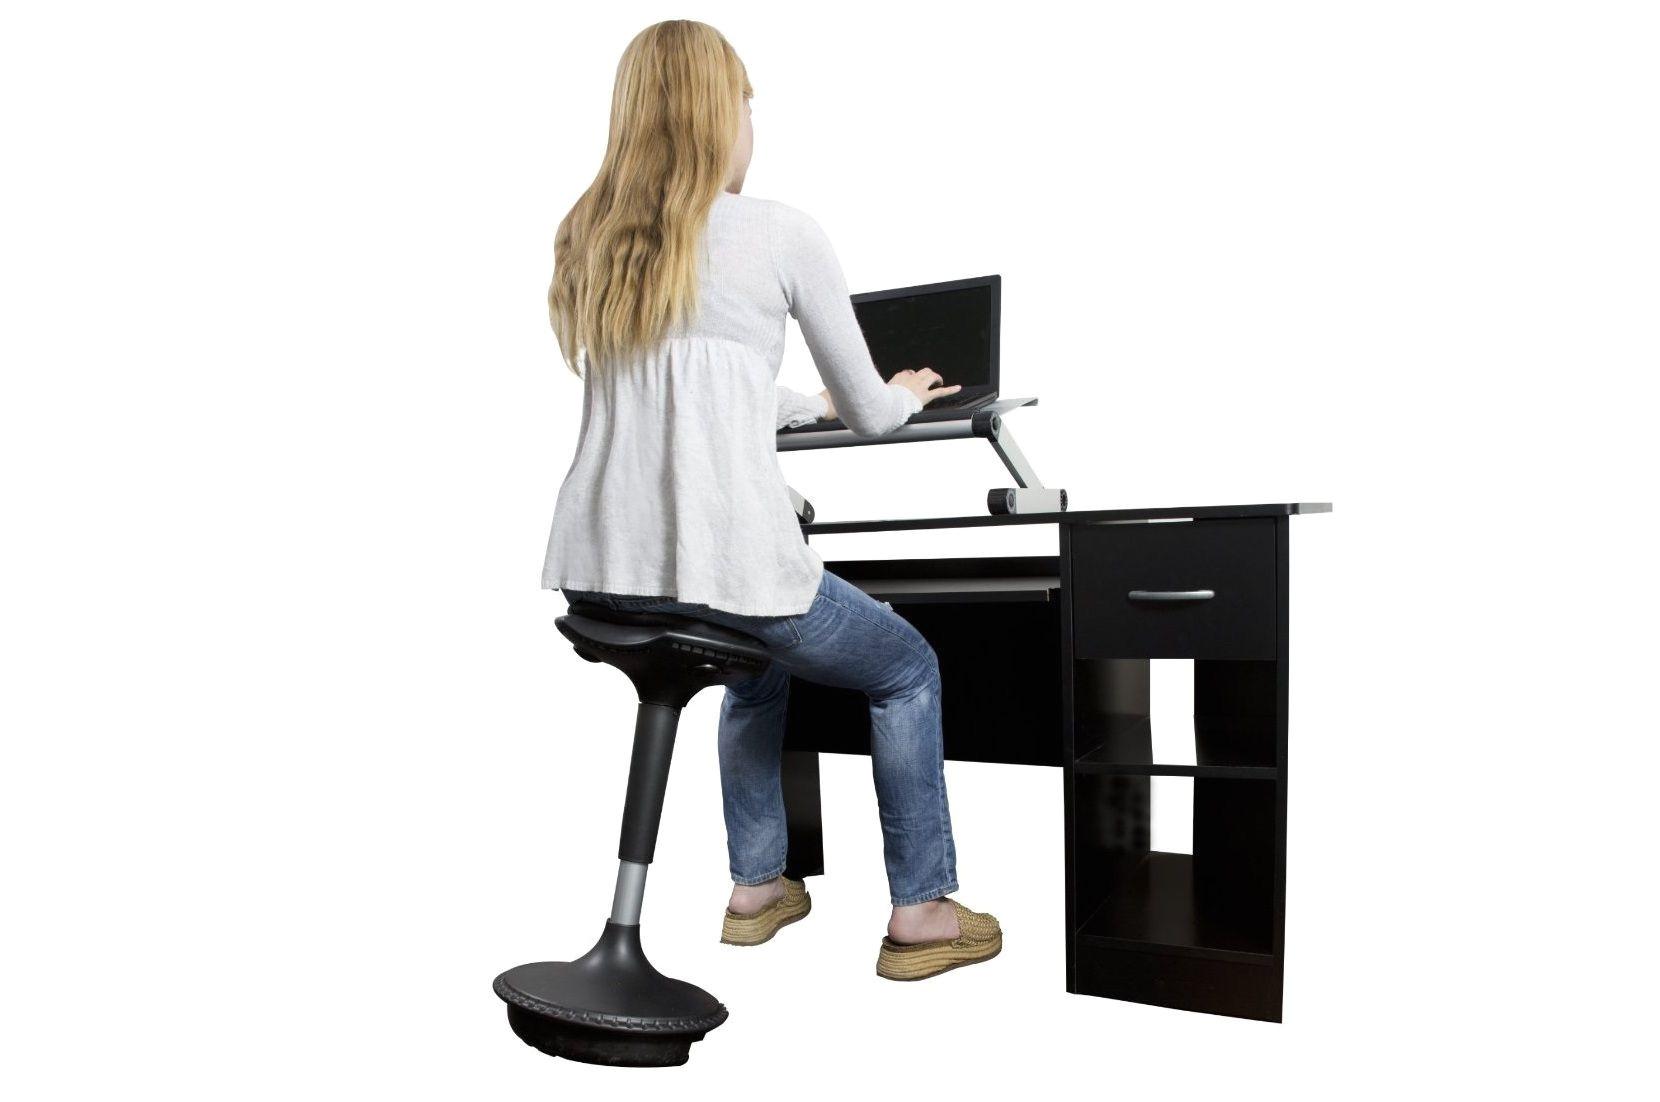 wobble stool amazon 569e6f2e5f9b58eba4ac5e42 jpg